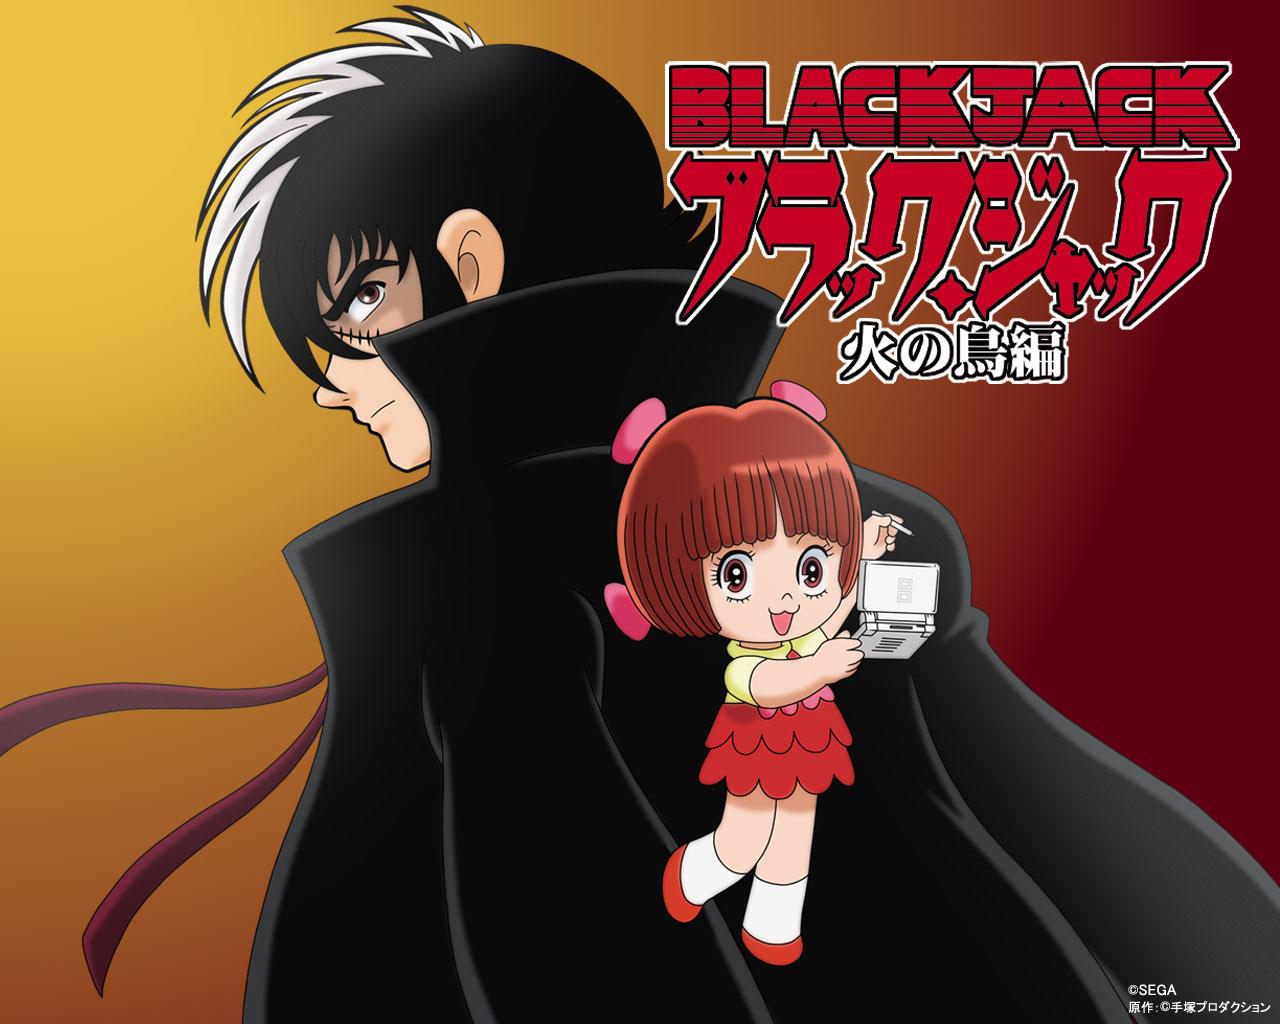 Hentai Black Hair Junge Anime Emo Cyber Homosexuell